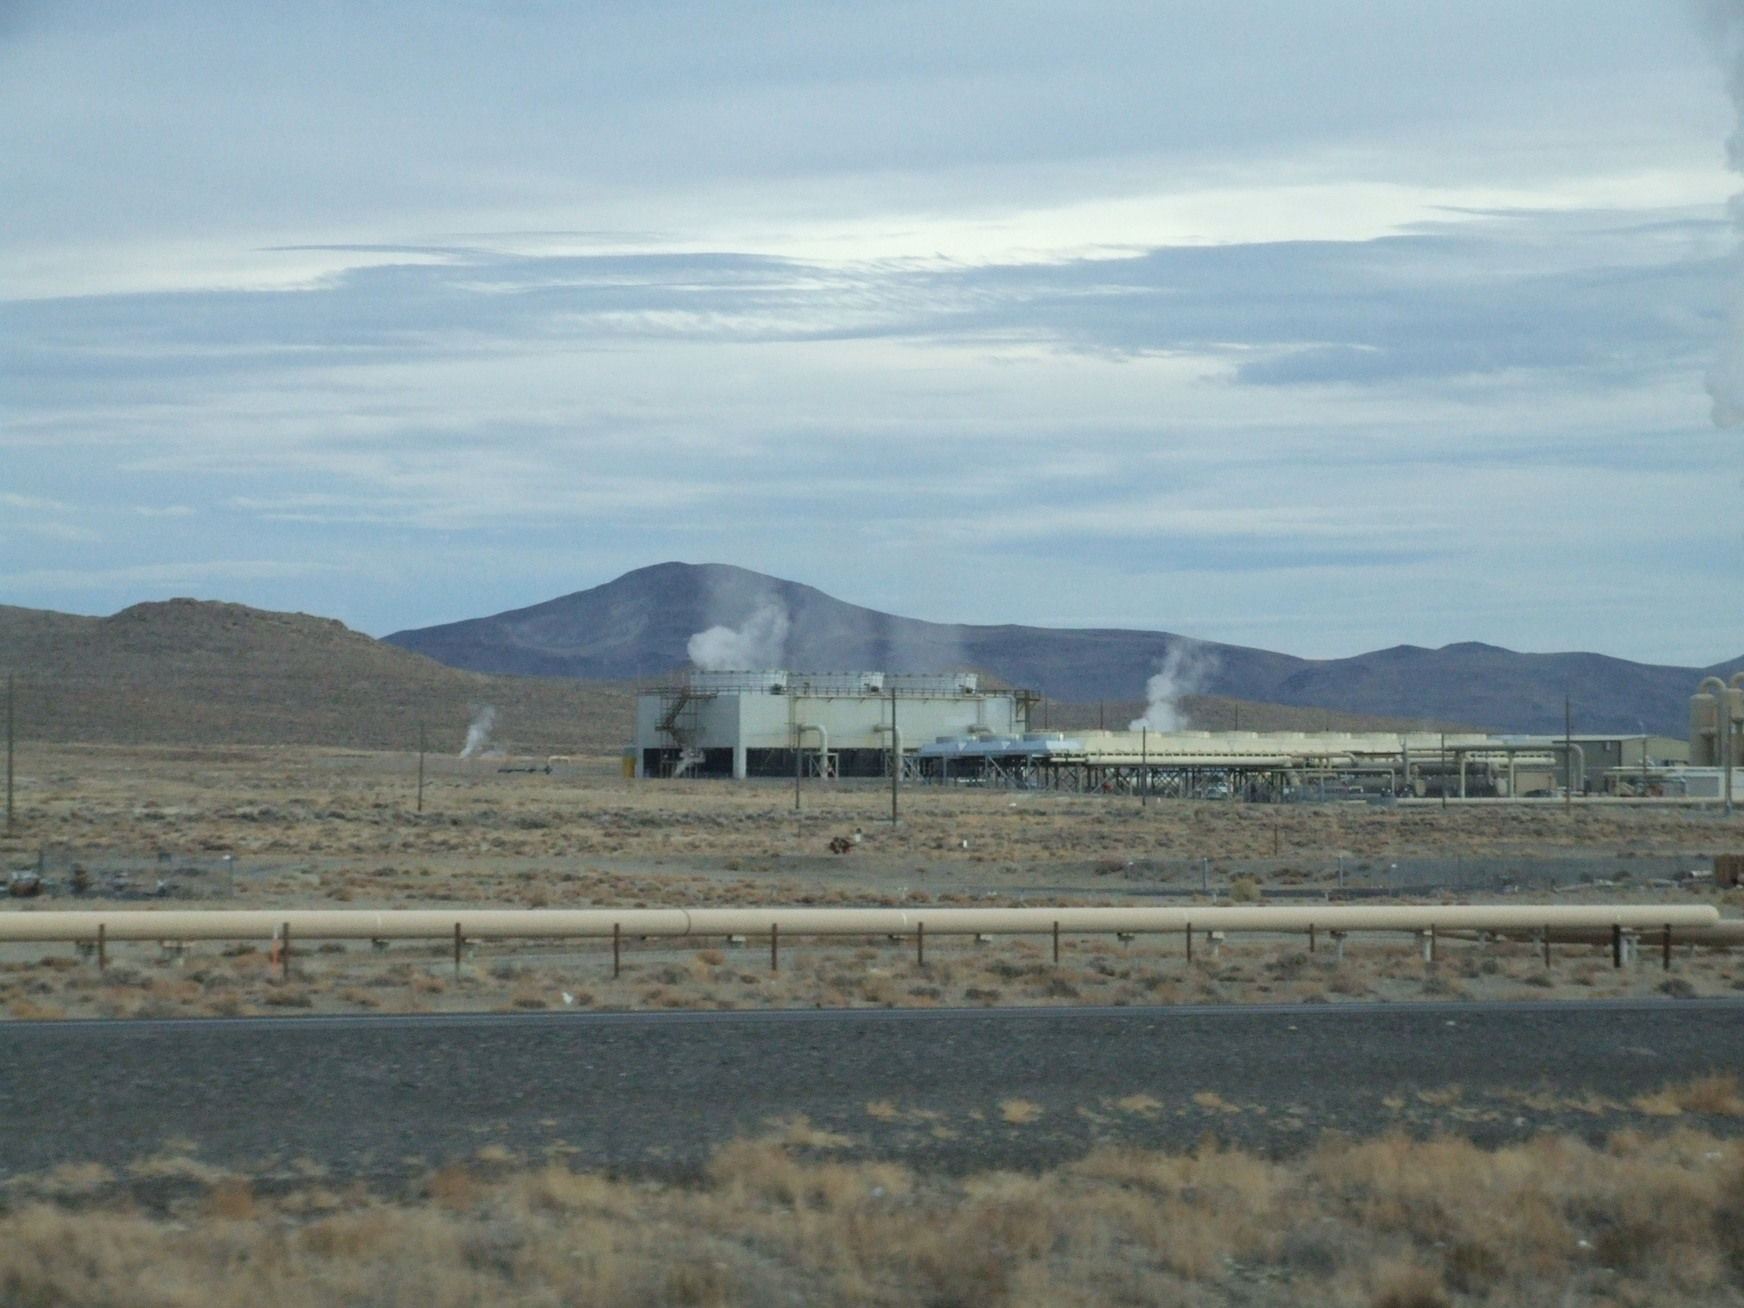 Nightingale Hot Springs, Nevada - November 16, 2007